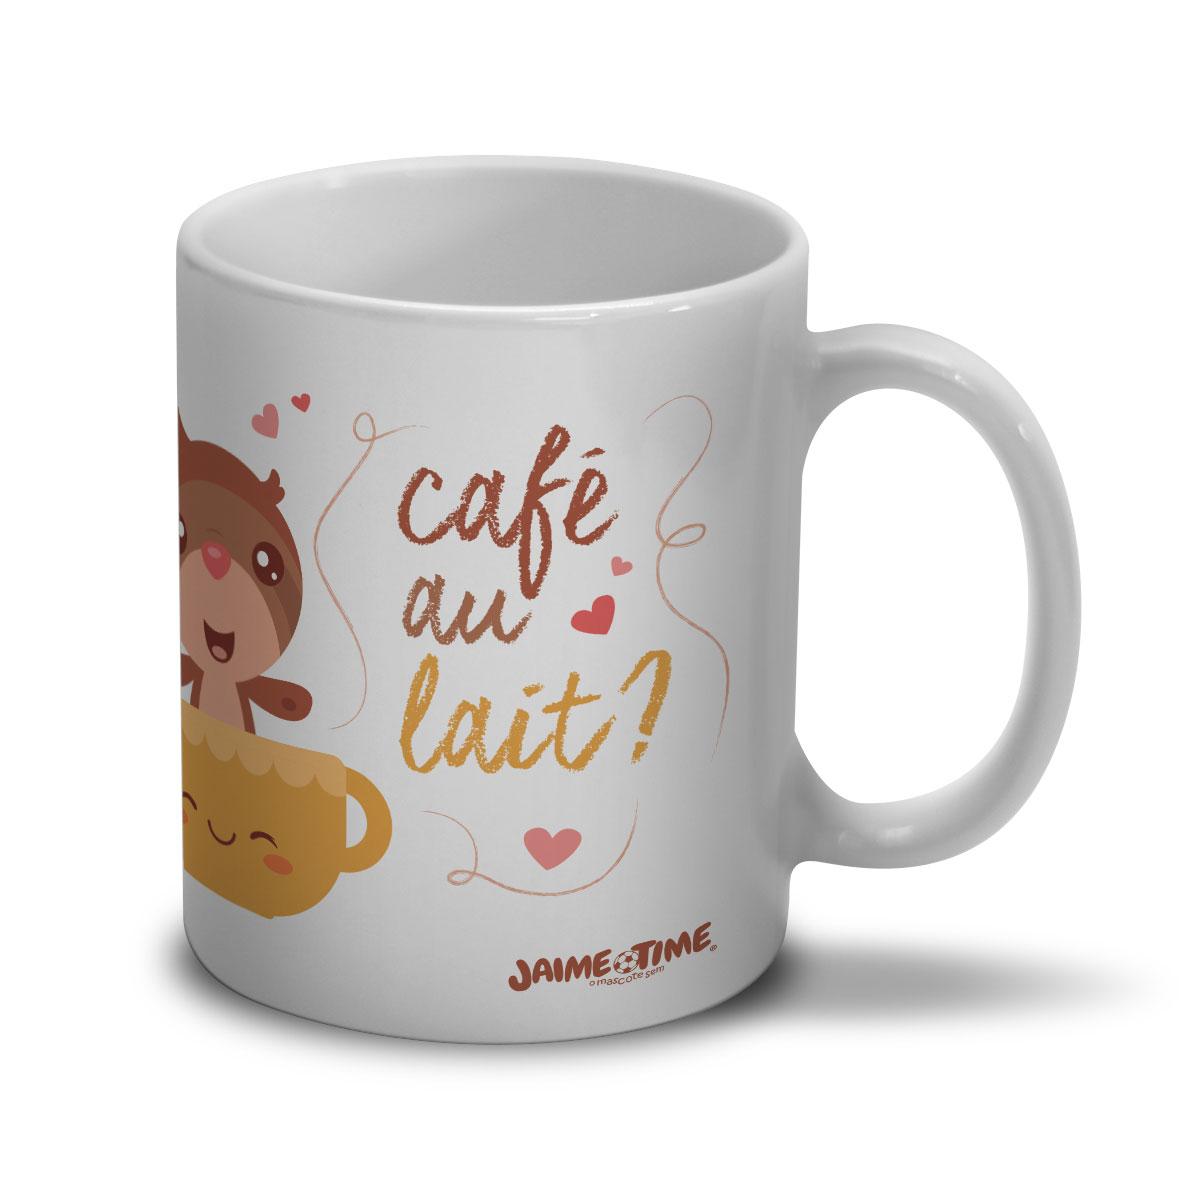 Caneca Jaime Cafe au Lait?